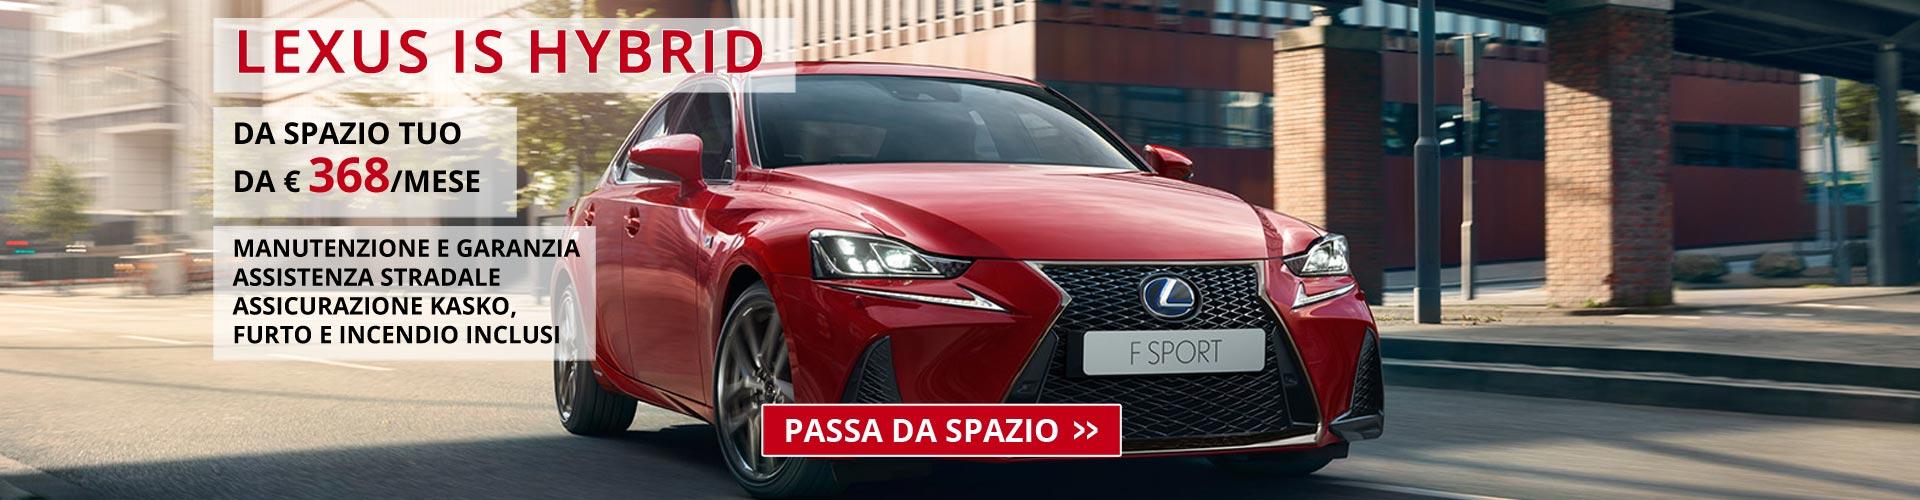 Lexus IS Hybrid da Spazio Torino